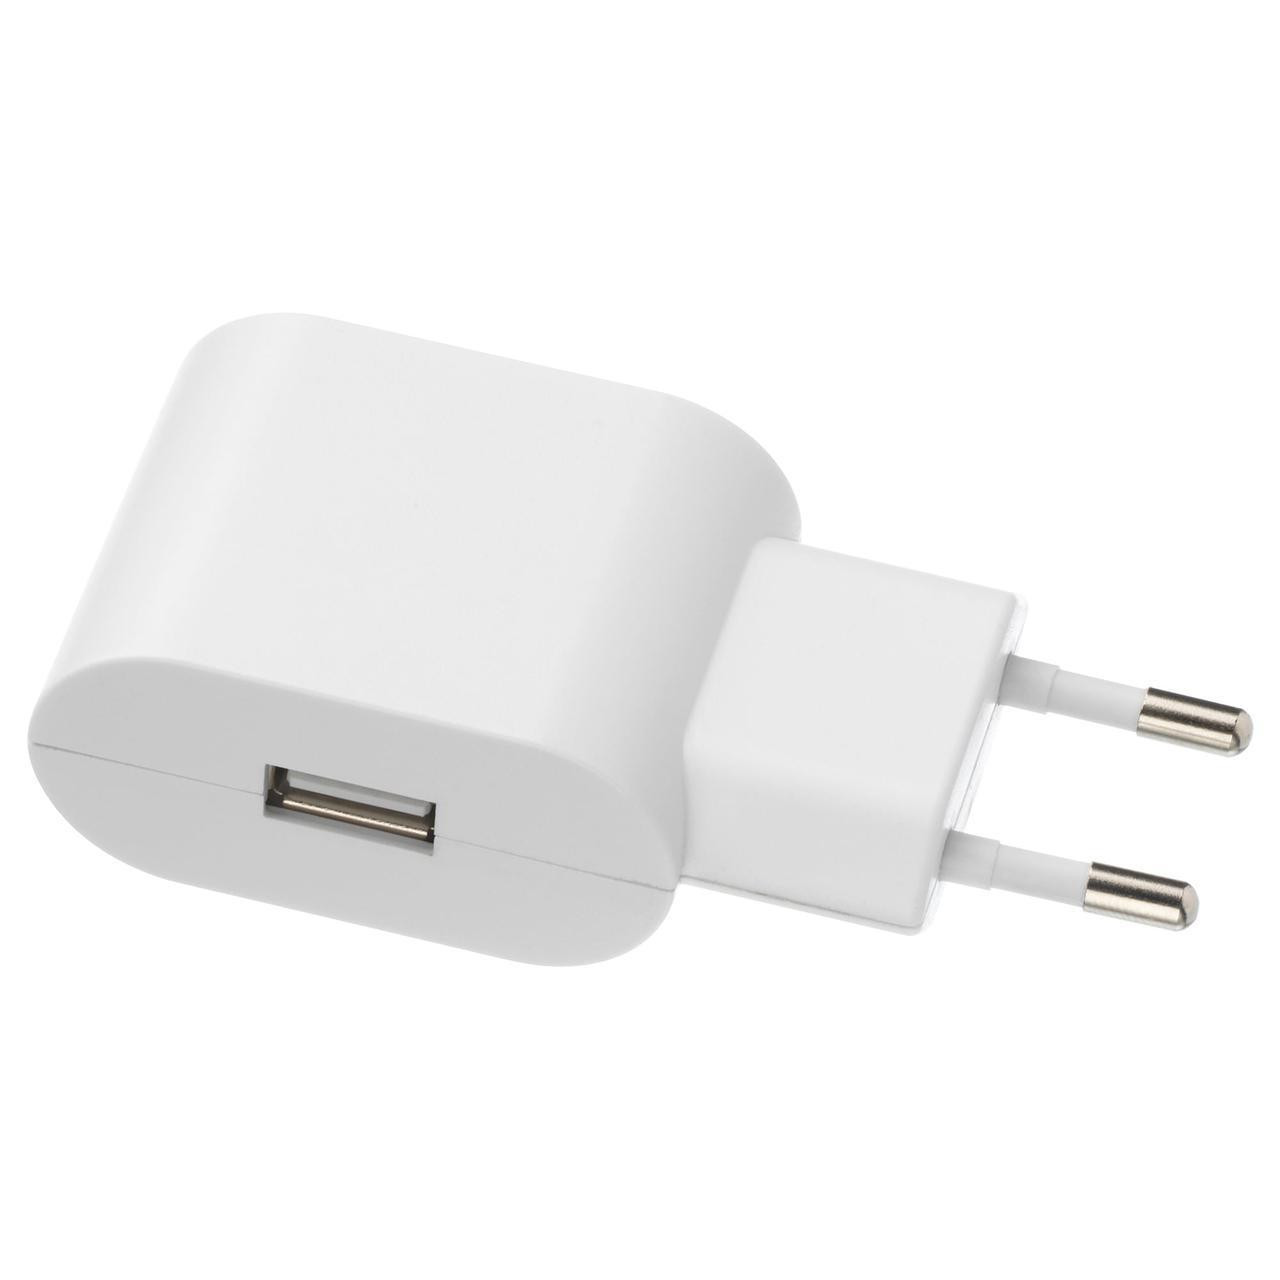 IKEA KOPPLA Зарядное устройство USB, 1 порт, белый  (404.122.78)